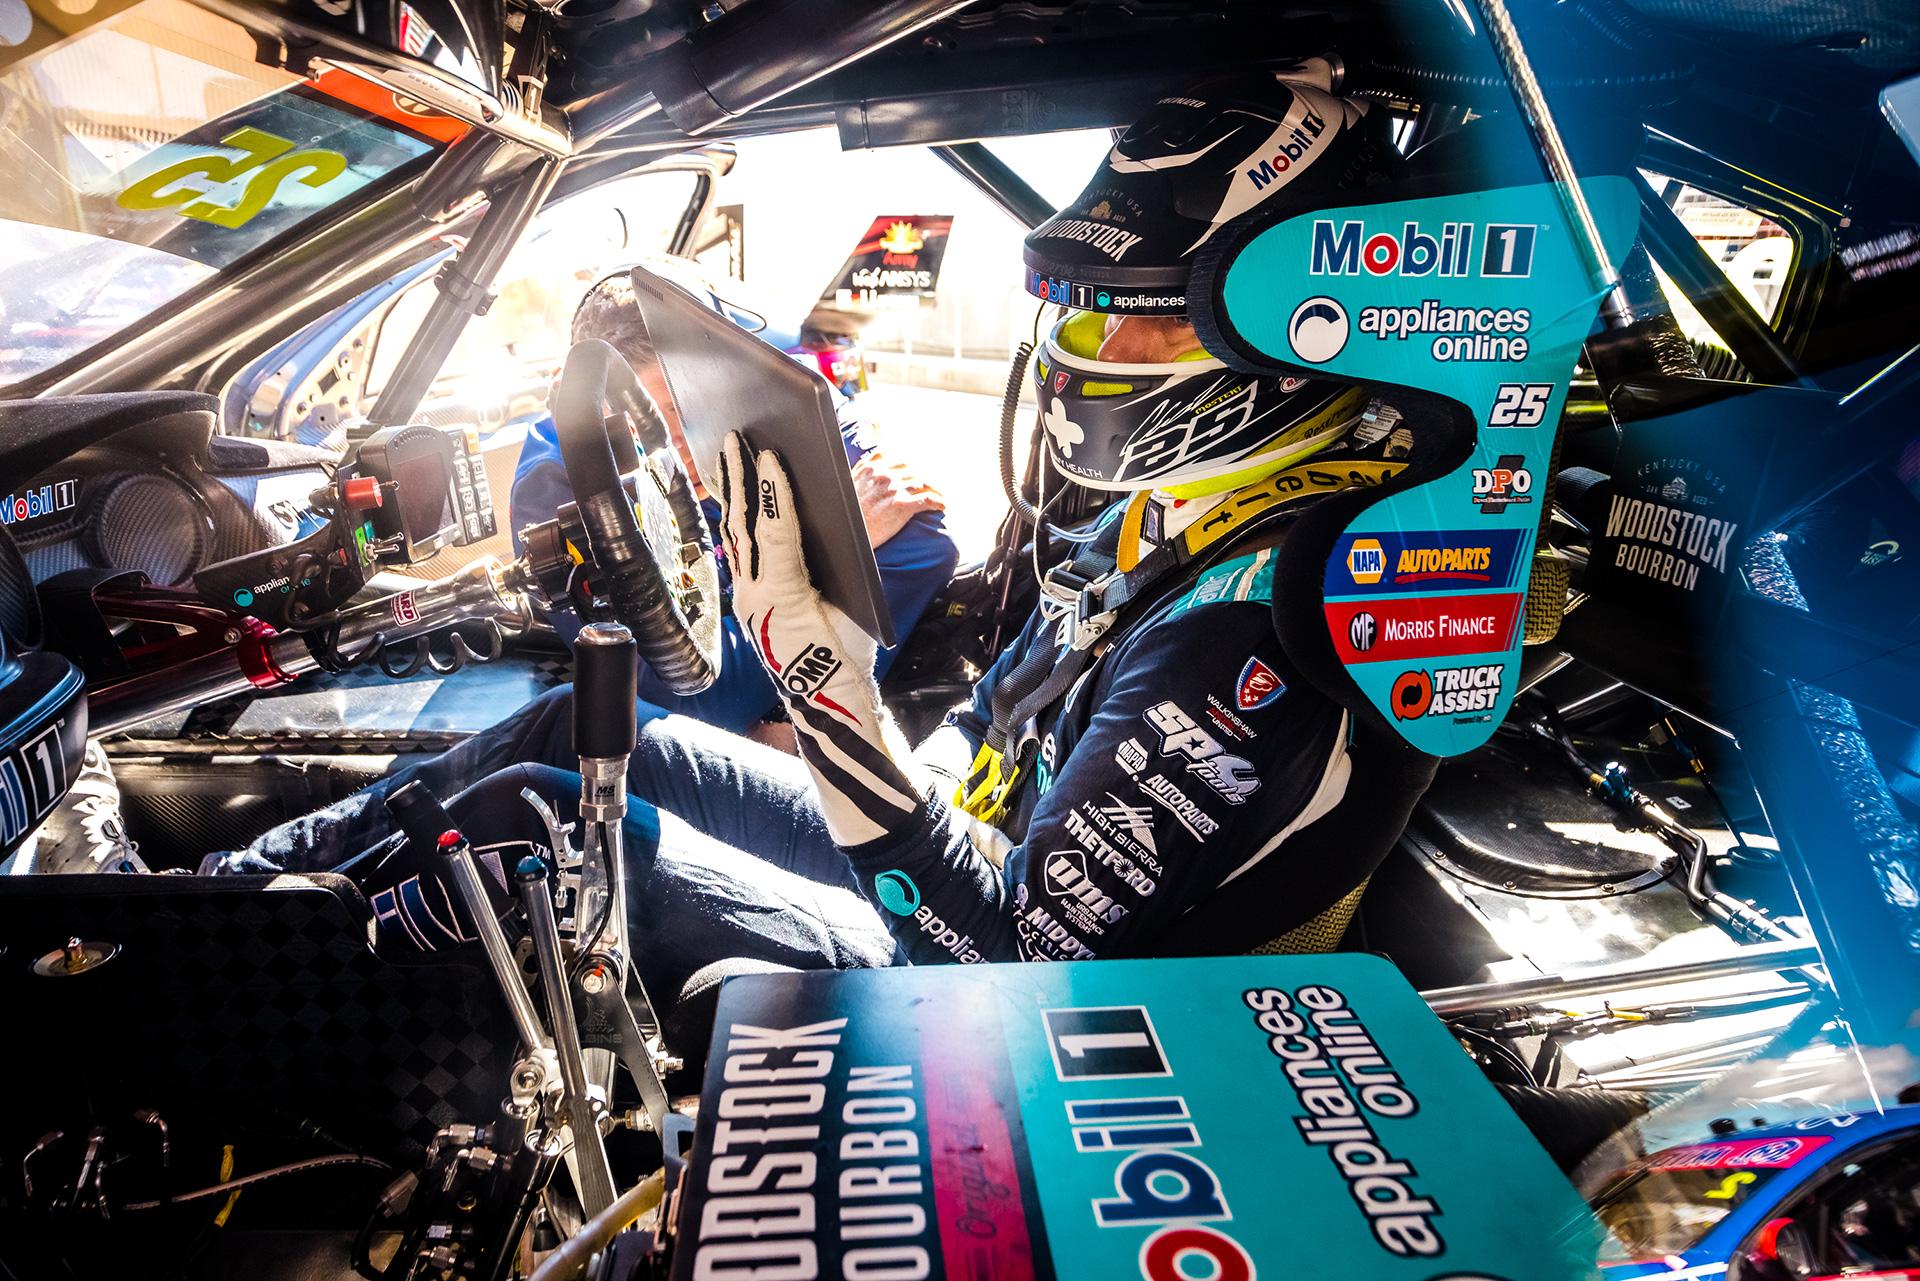 Chaz Mostert inside the Mobil 1 Appliances Online No. 25.